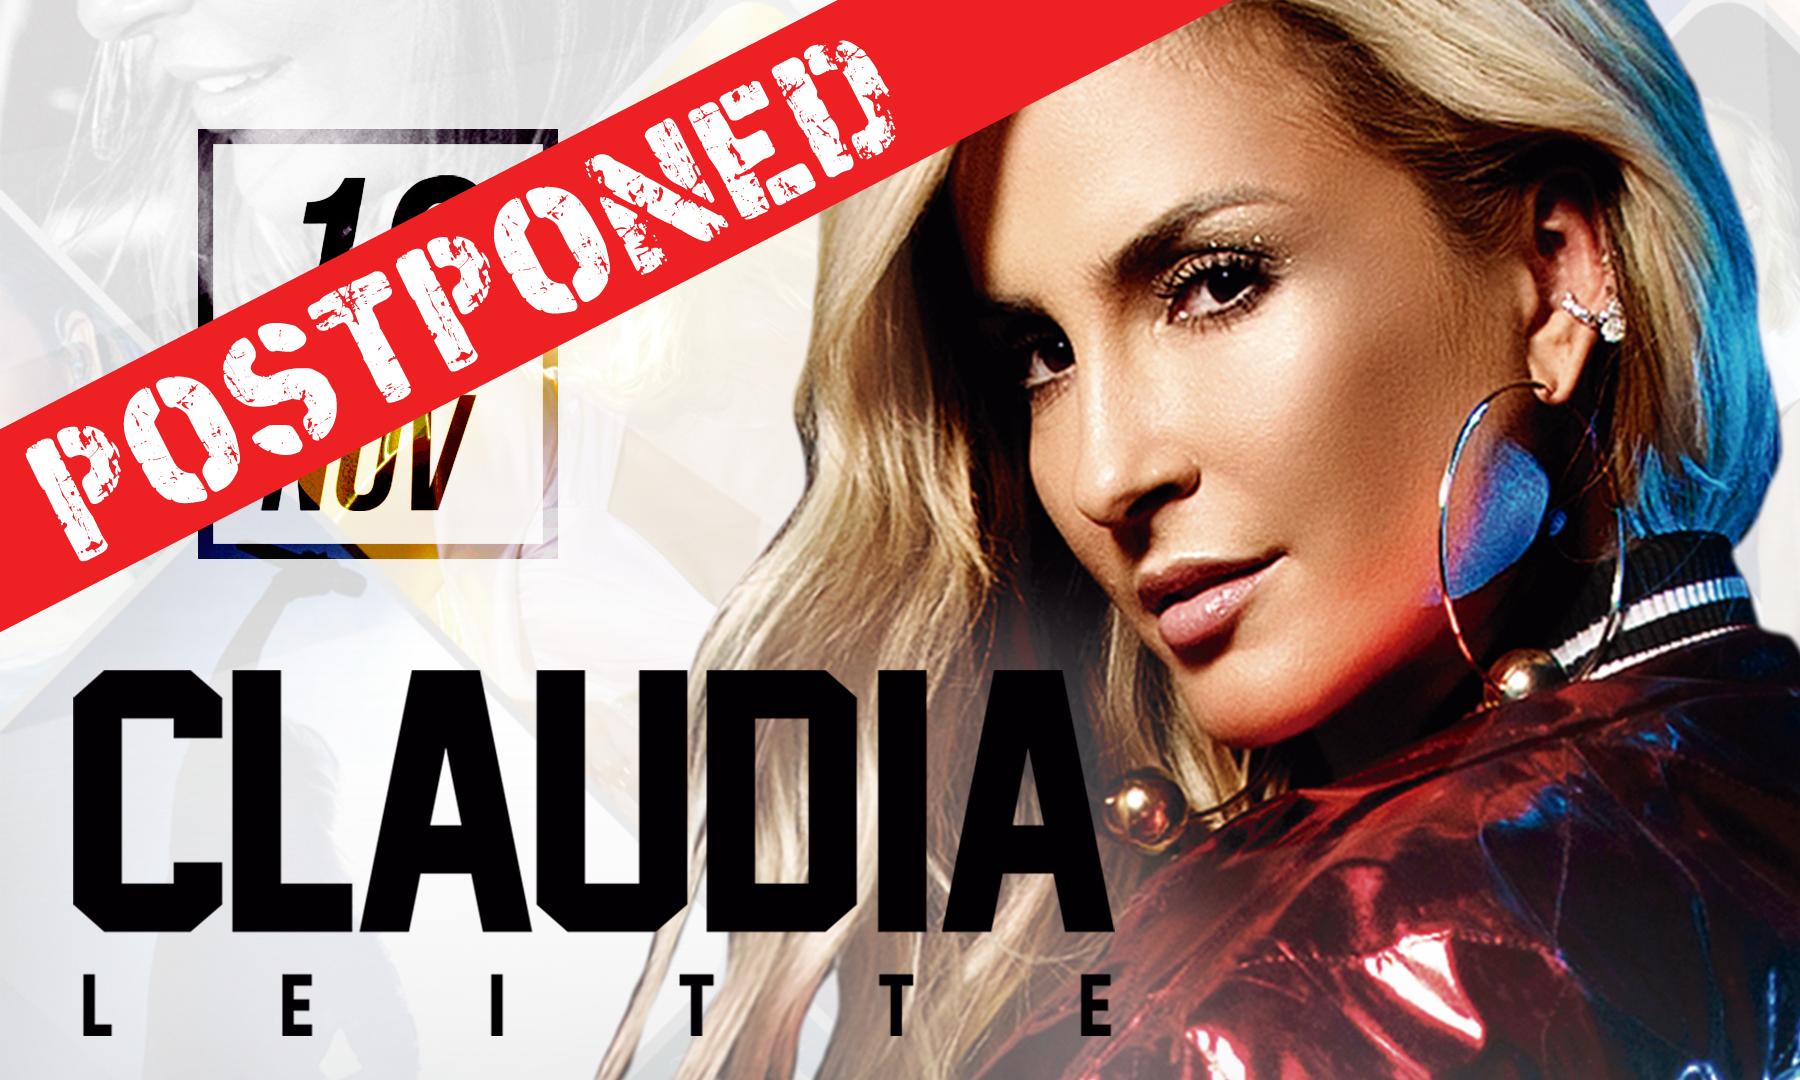 POSTPONED – Claudia Leitte USA Concert Tour 2017